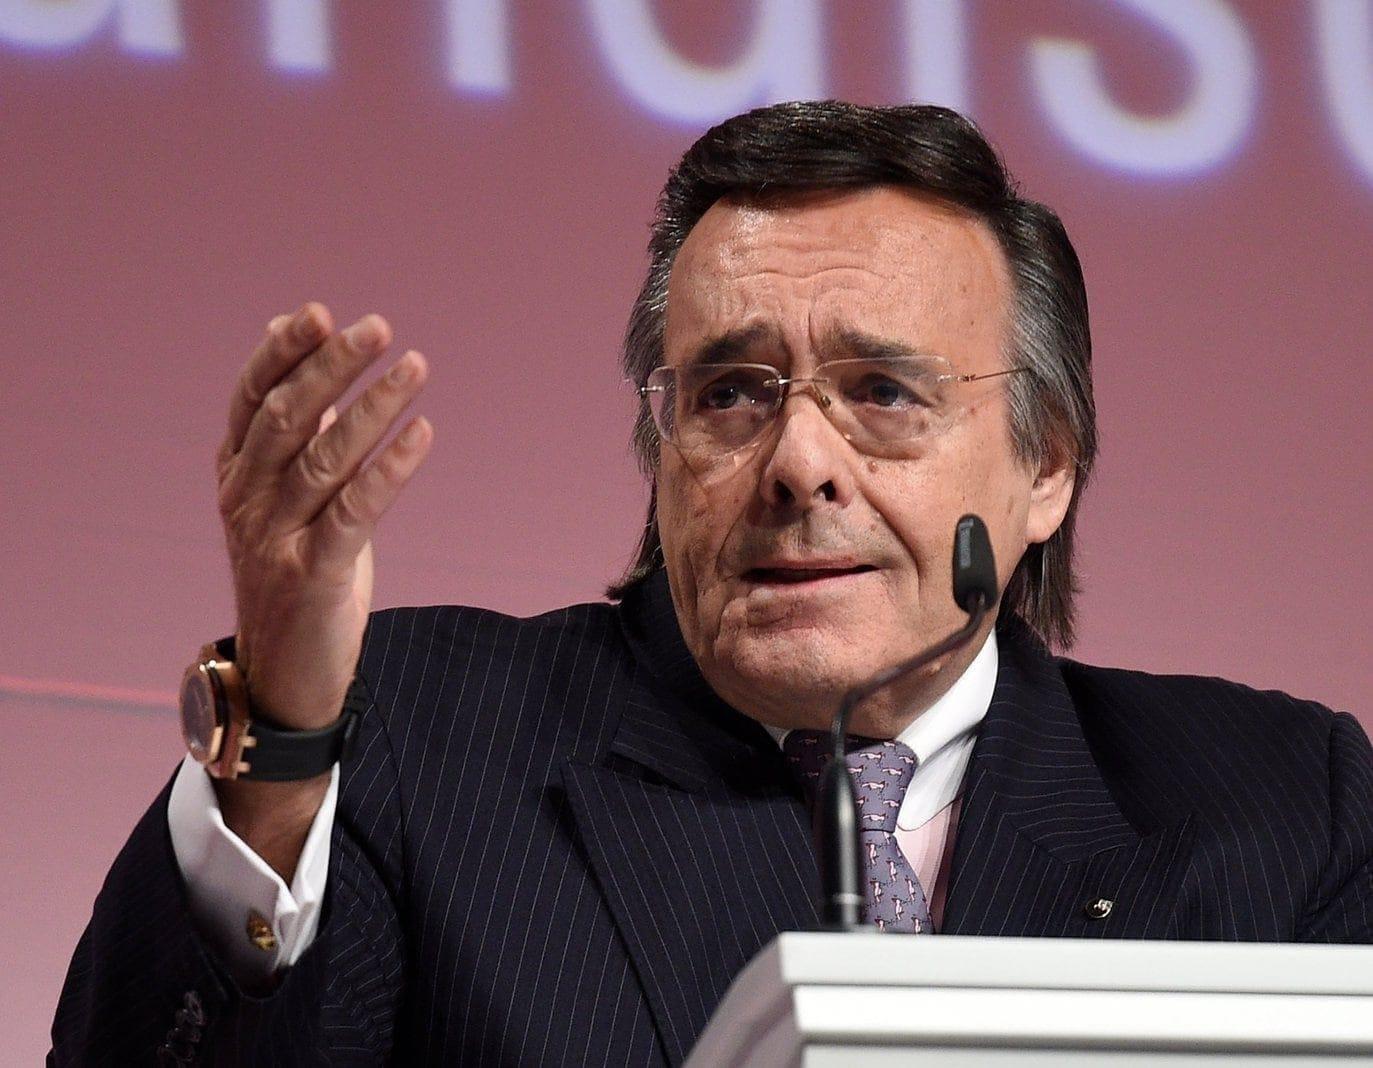 Mittelstandspräsident Mario Ohoven stirbt bei Verkehrsunfall